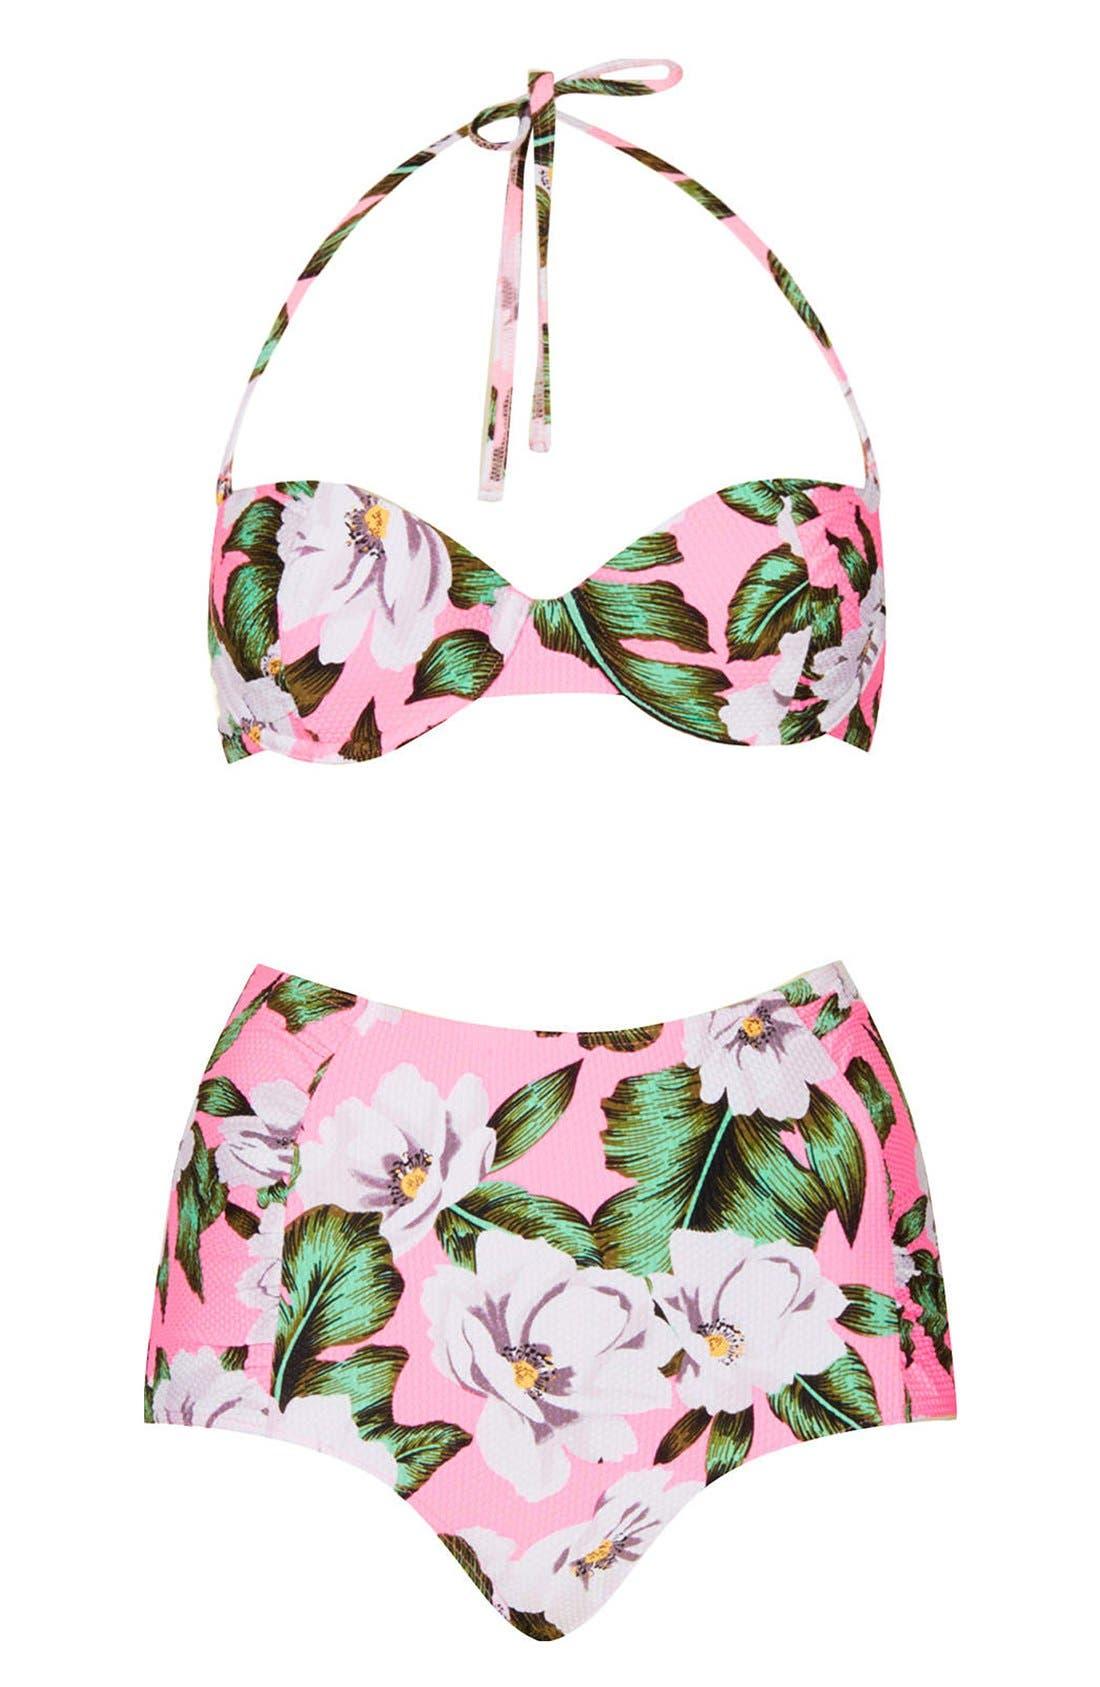 Alternate Image 1 Selected - Topshop 'Aloha' Print Floral Bikini